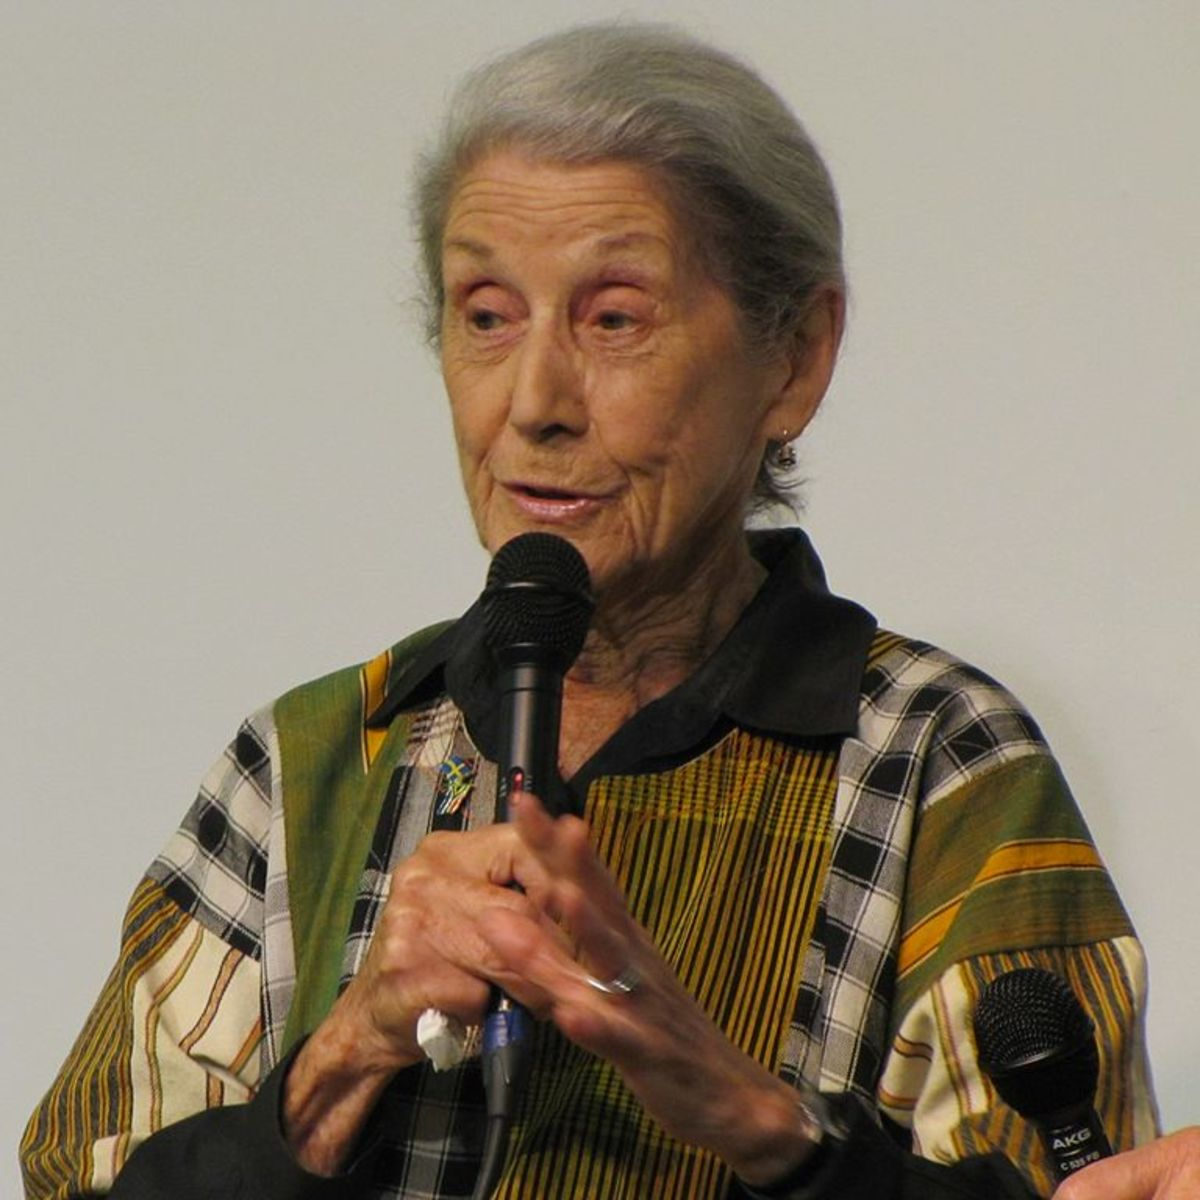 South African writer and political activist Nadine Gordimer at the Göteborg Book Fair 2010.